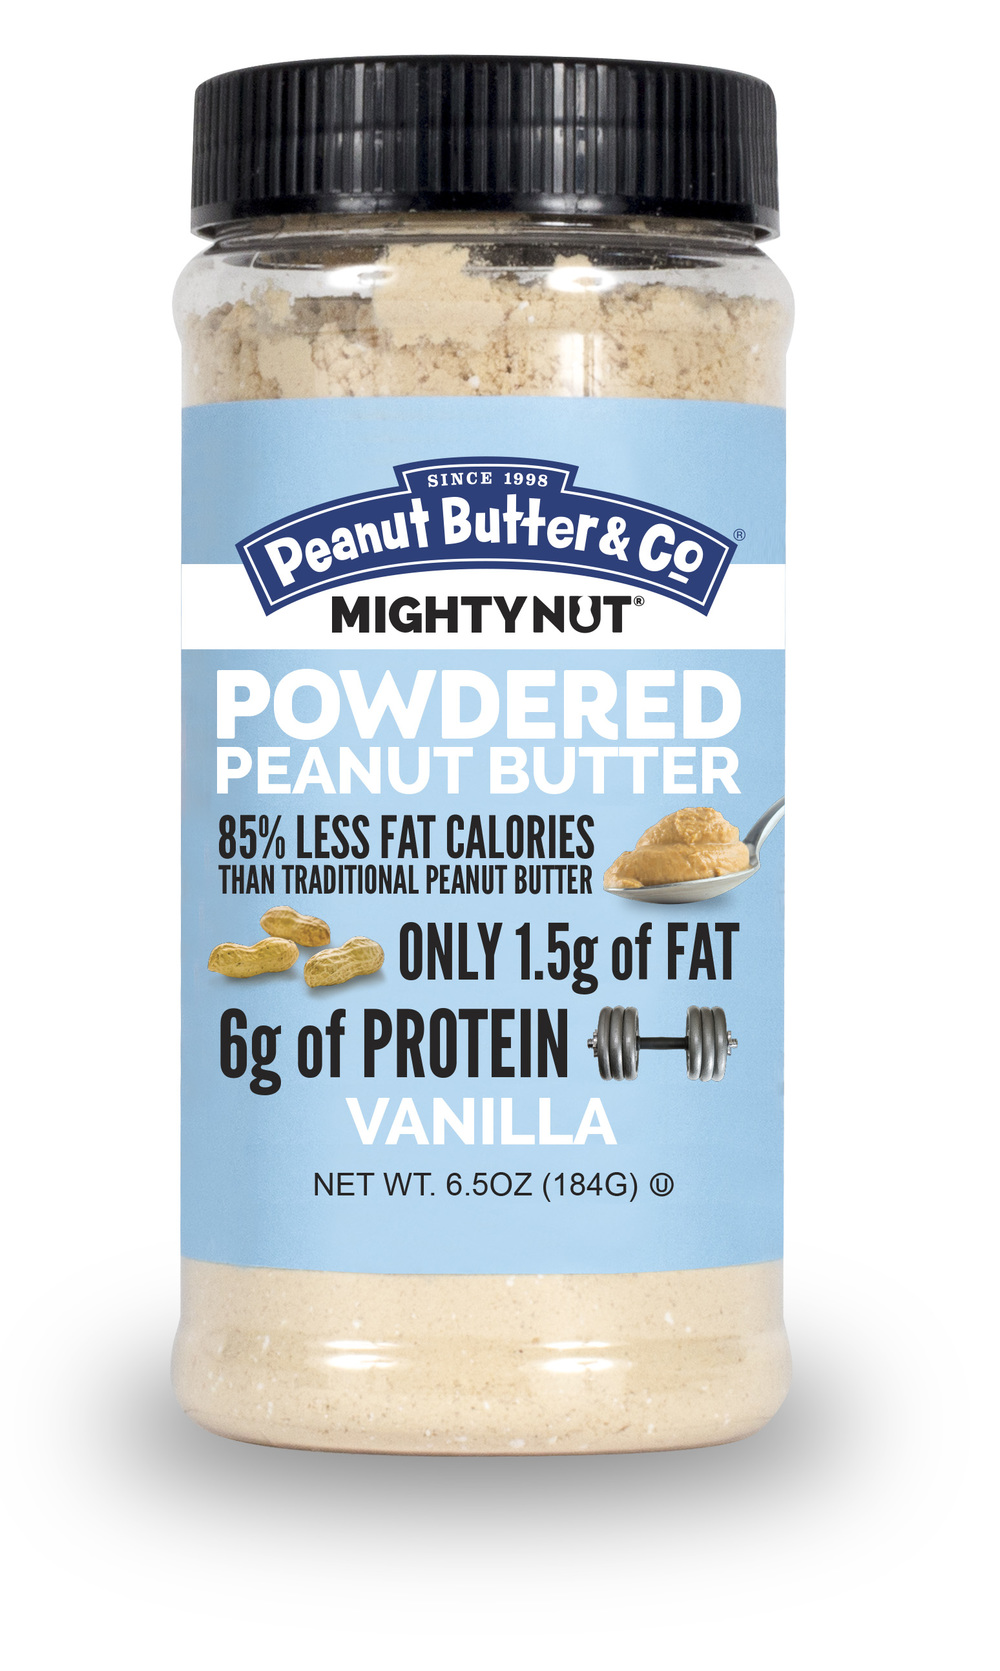 MightyNut-Vanilla-Powdered-peanut-butter.jpg